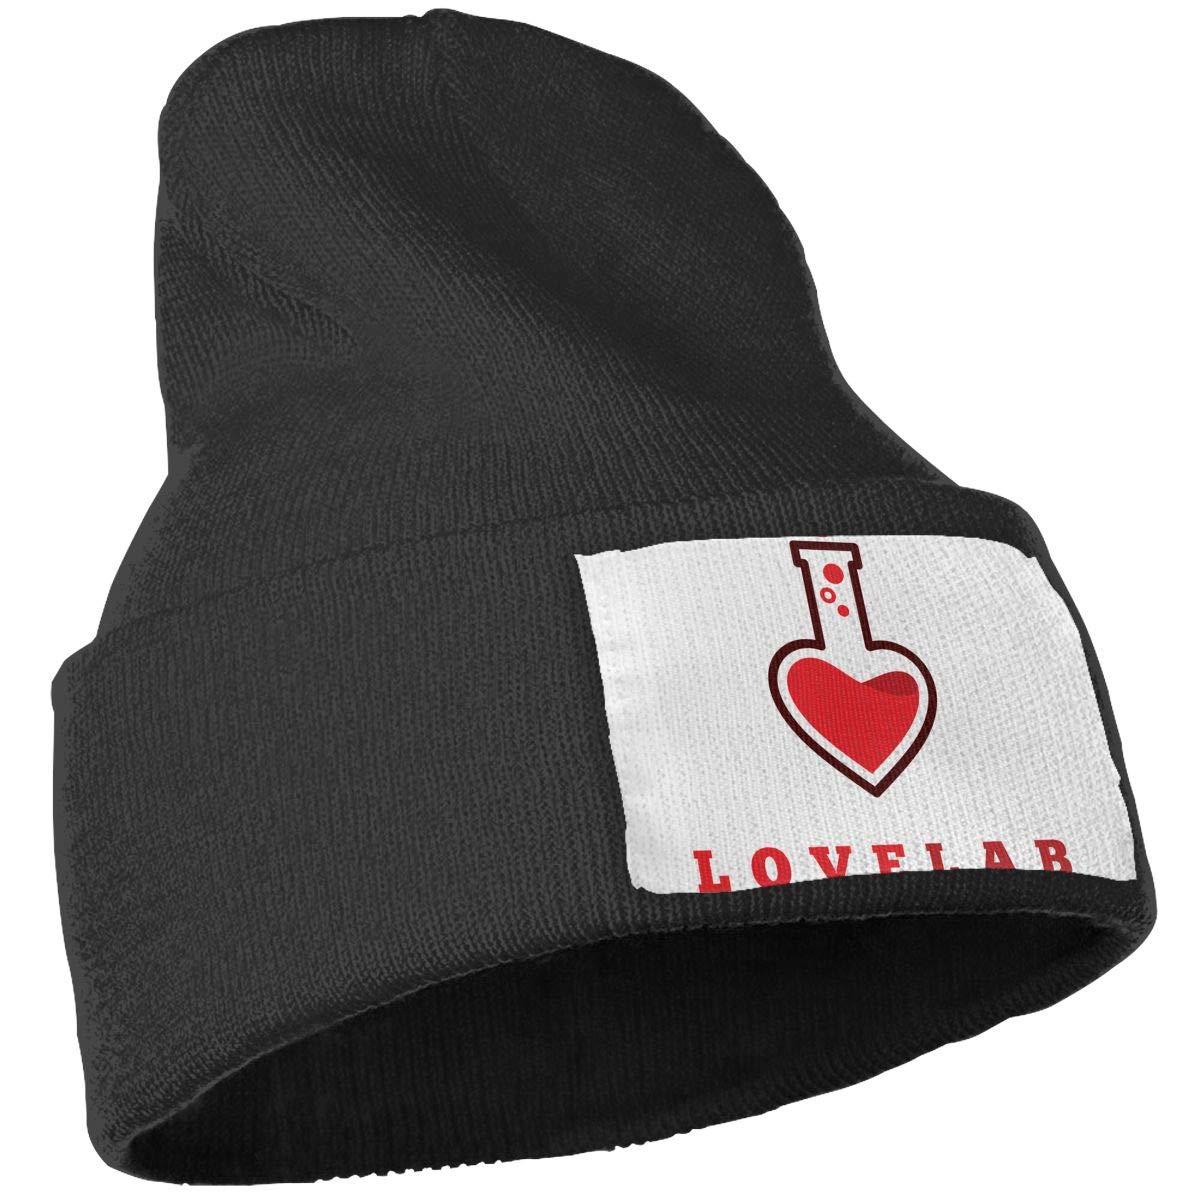 Love Lab Logo Unisex Fashion Knitted Hat Luxury Hip-Hop Cap